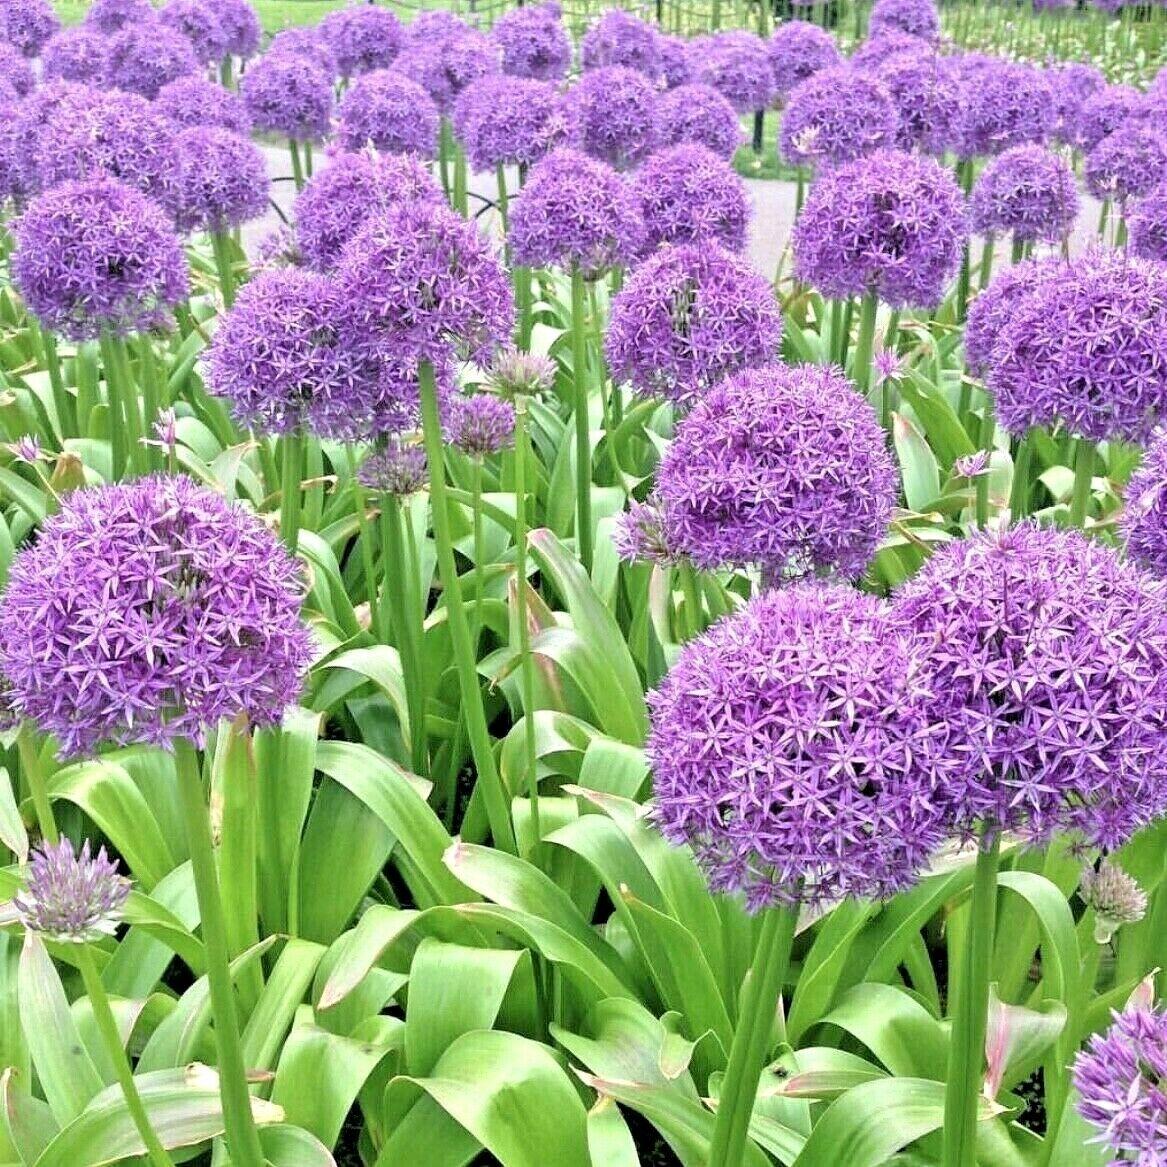 8 Allium Bulbs Gladiator Giant Perennial Plant Spring Flowering